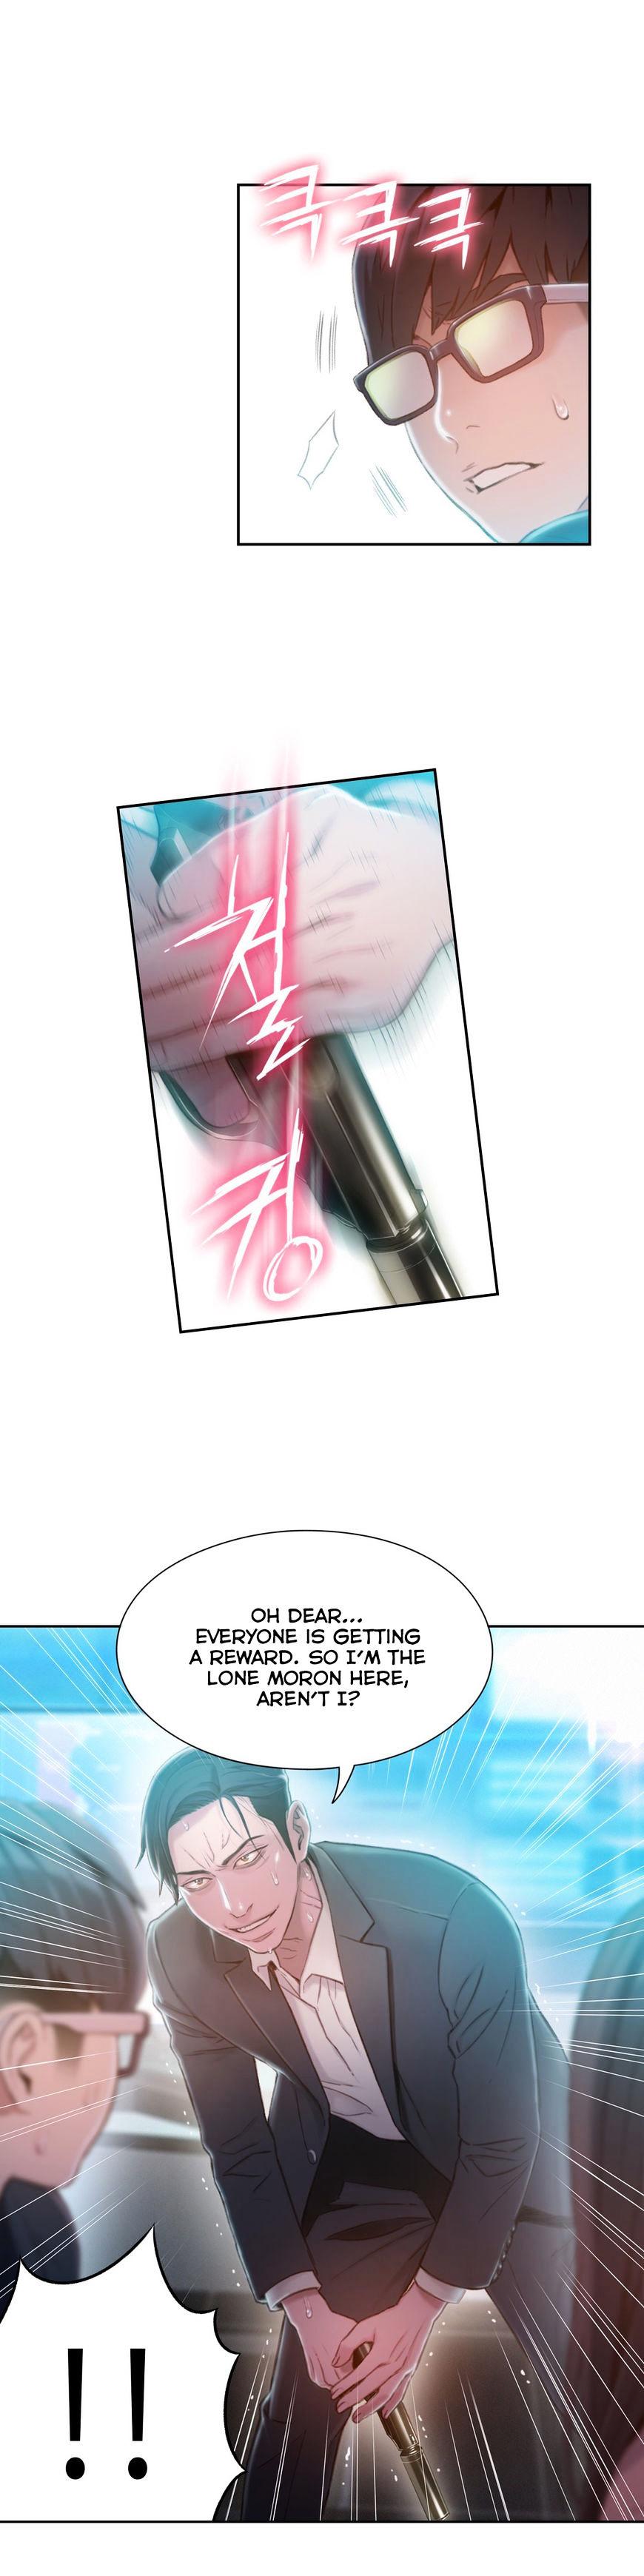 Sweet Guy Chapter 73 Full Manga Read Scan Image 14